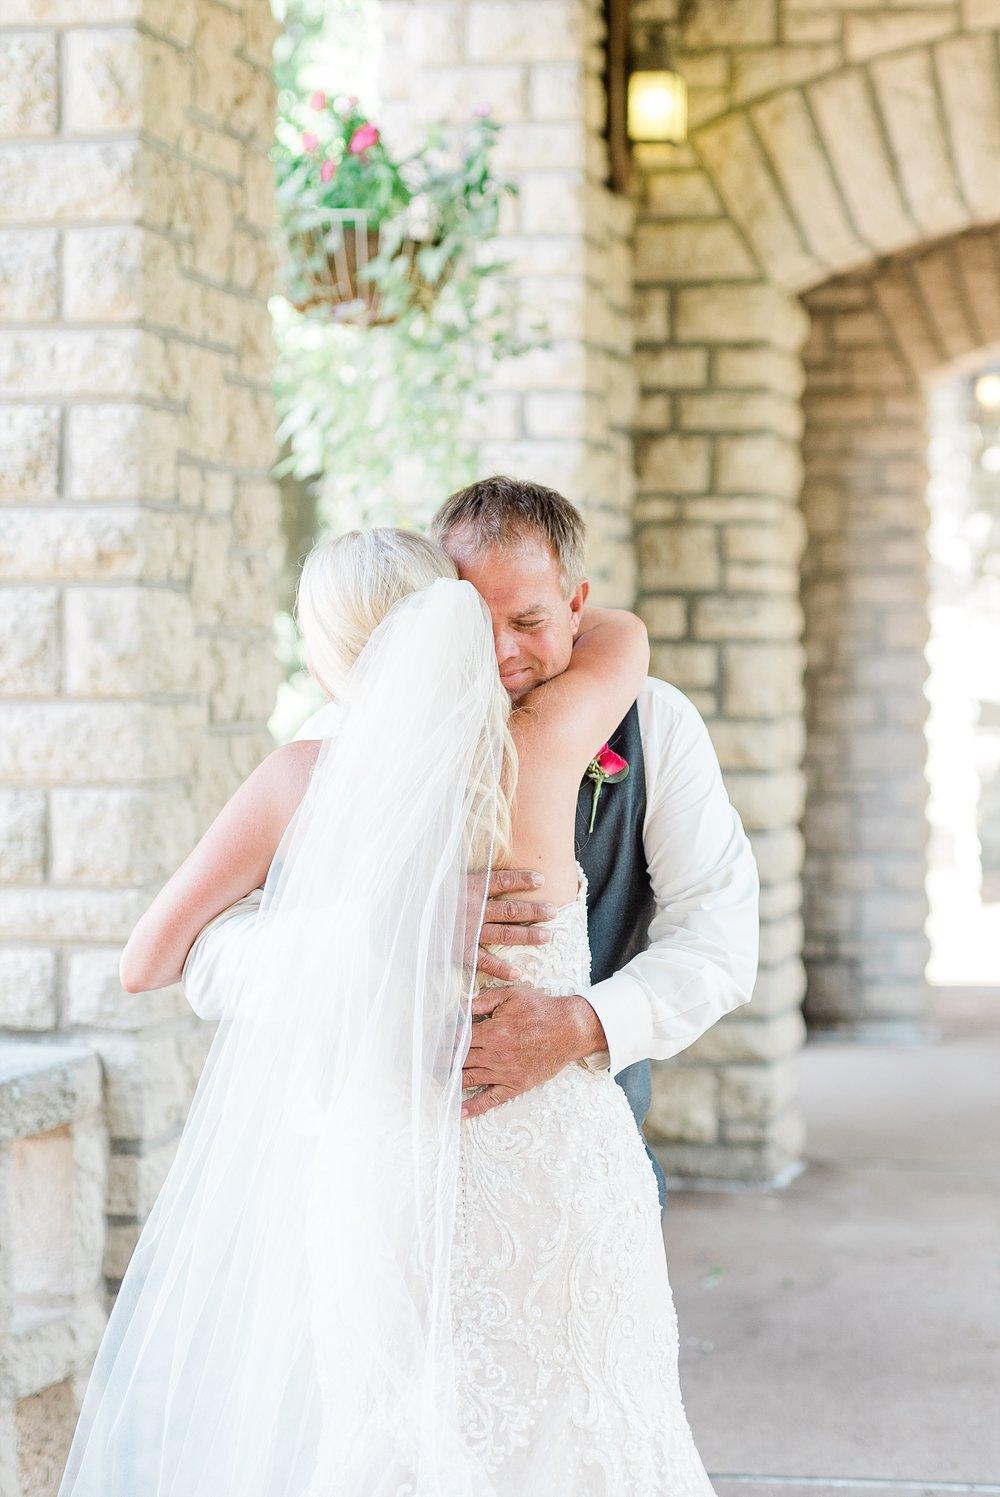 Alan and Heather Horn Wedding by Kelsi Kliethermes Photography Associate - Rachel_0031.jpg